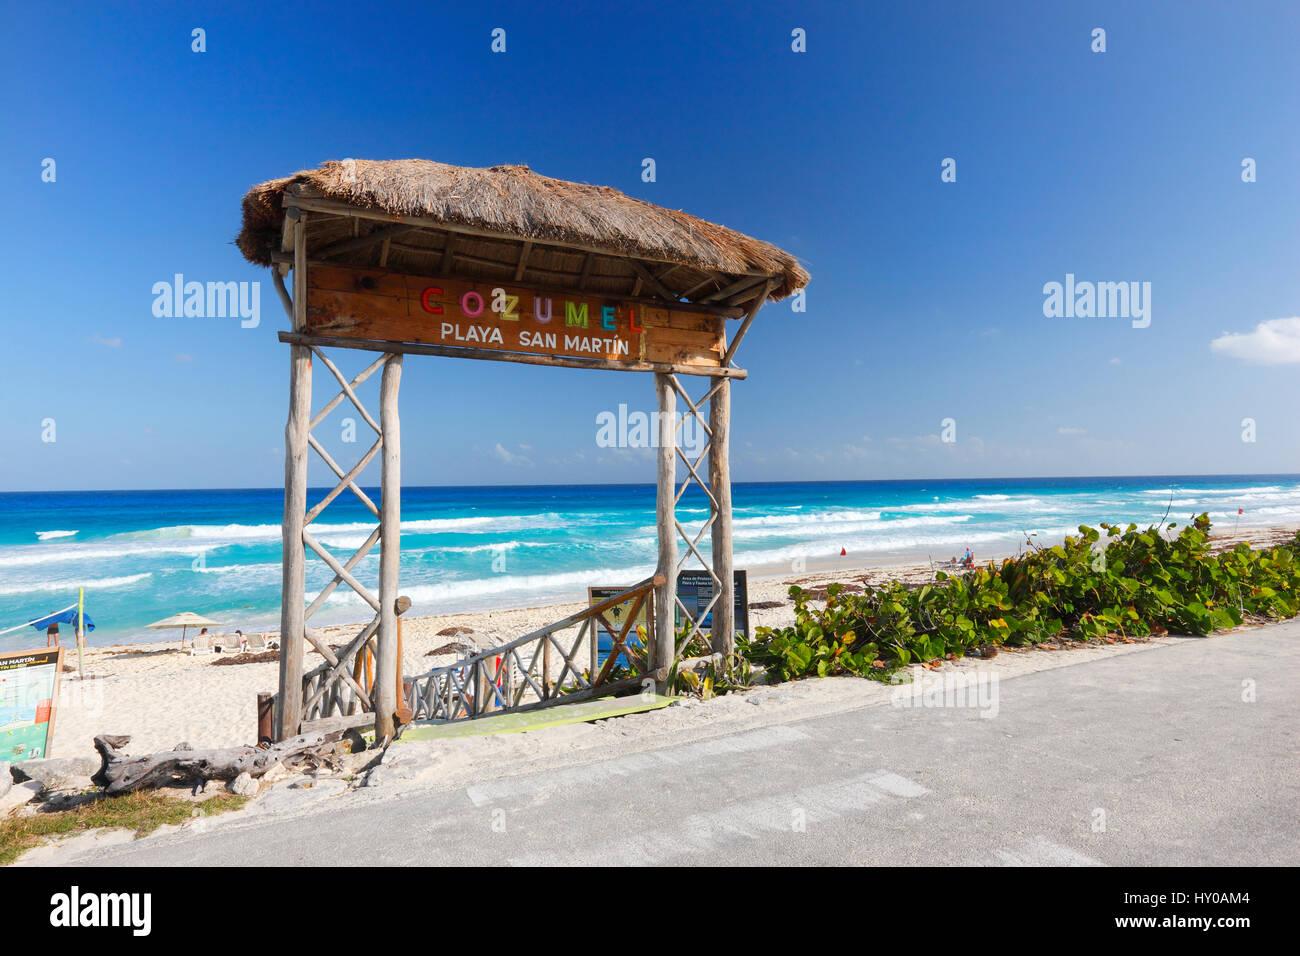 Cozumel beach San Martin - Stock Image